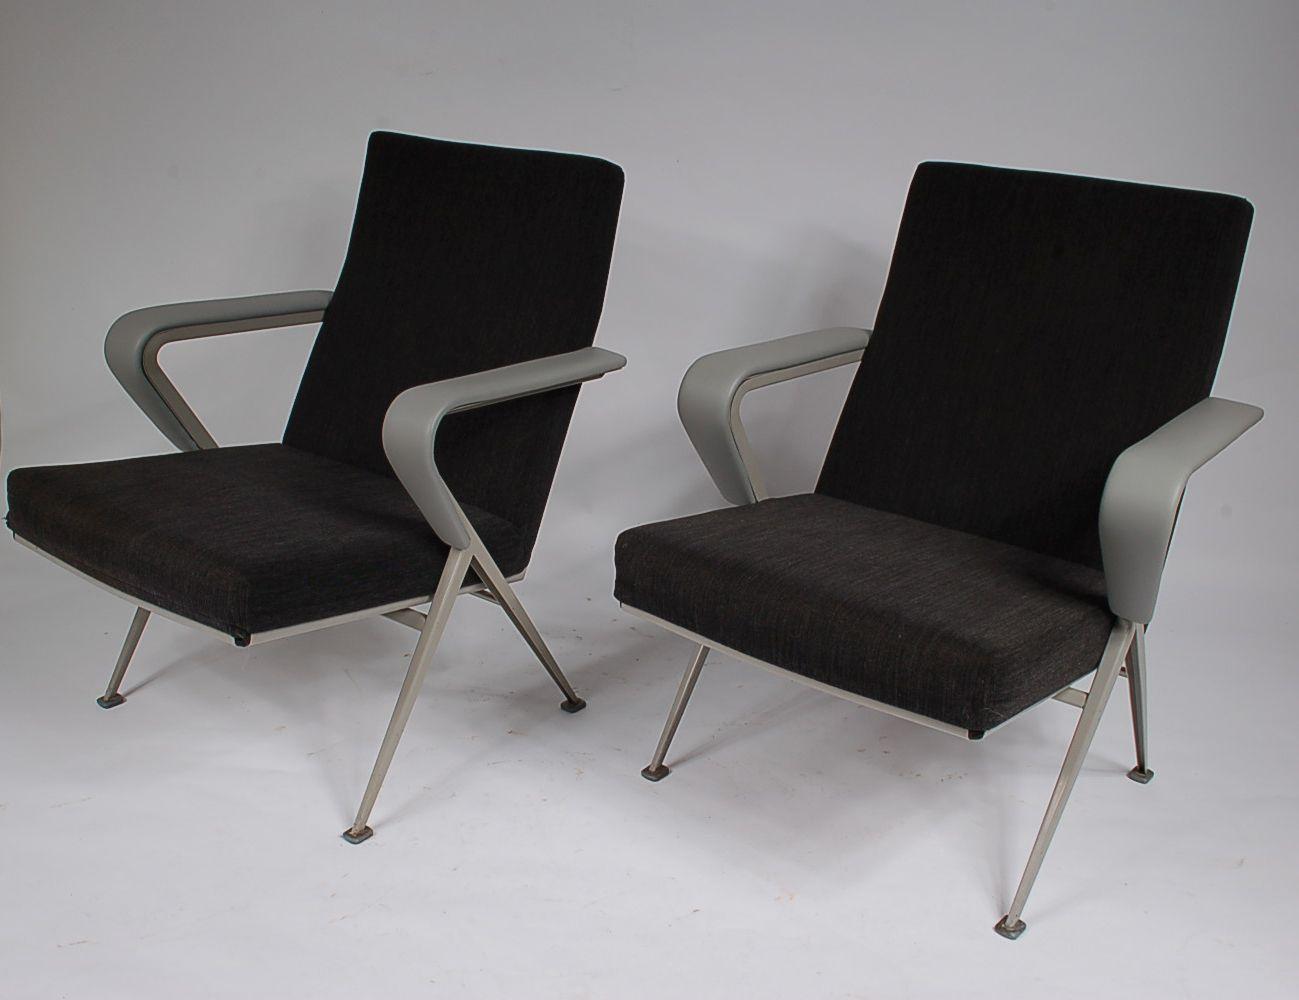 Industrial sessel 2er set 1960er bei pamono kaufen for Sessel industrial